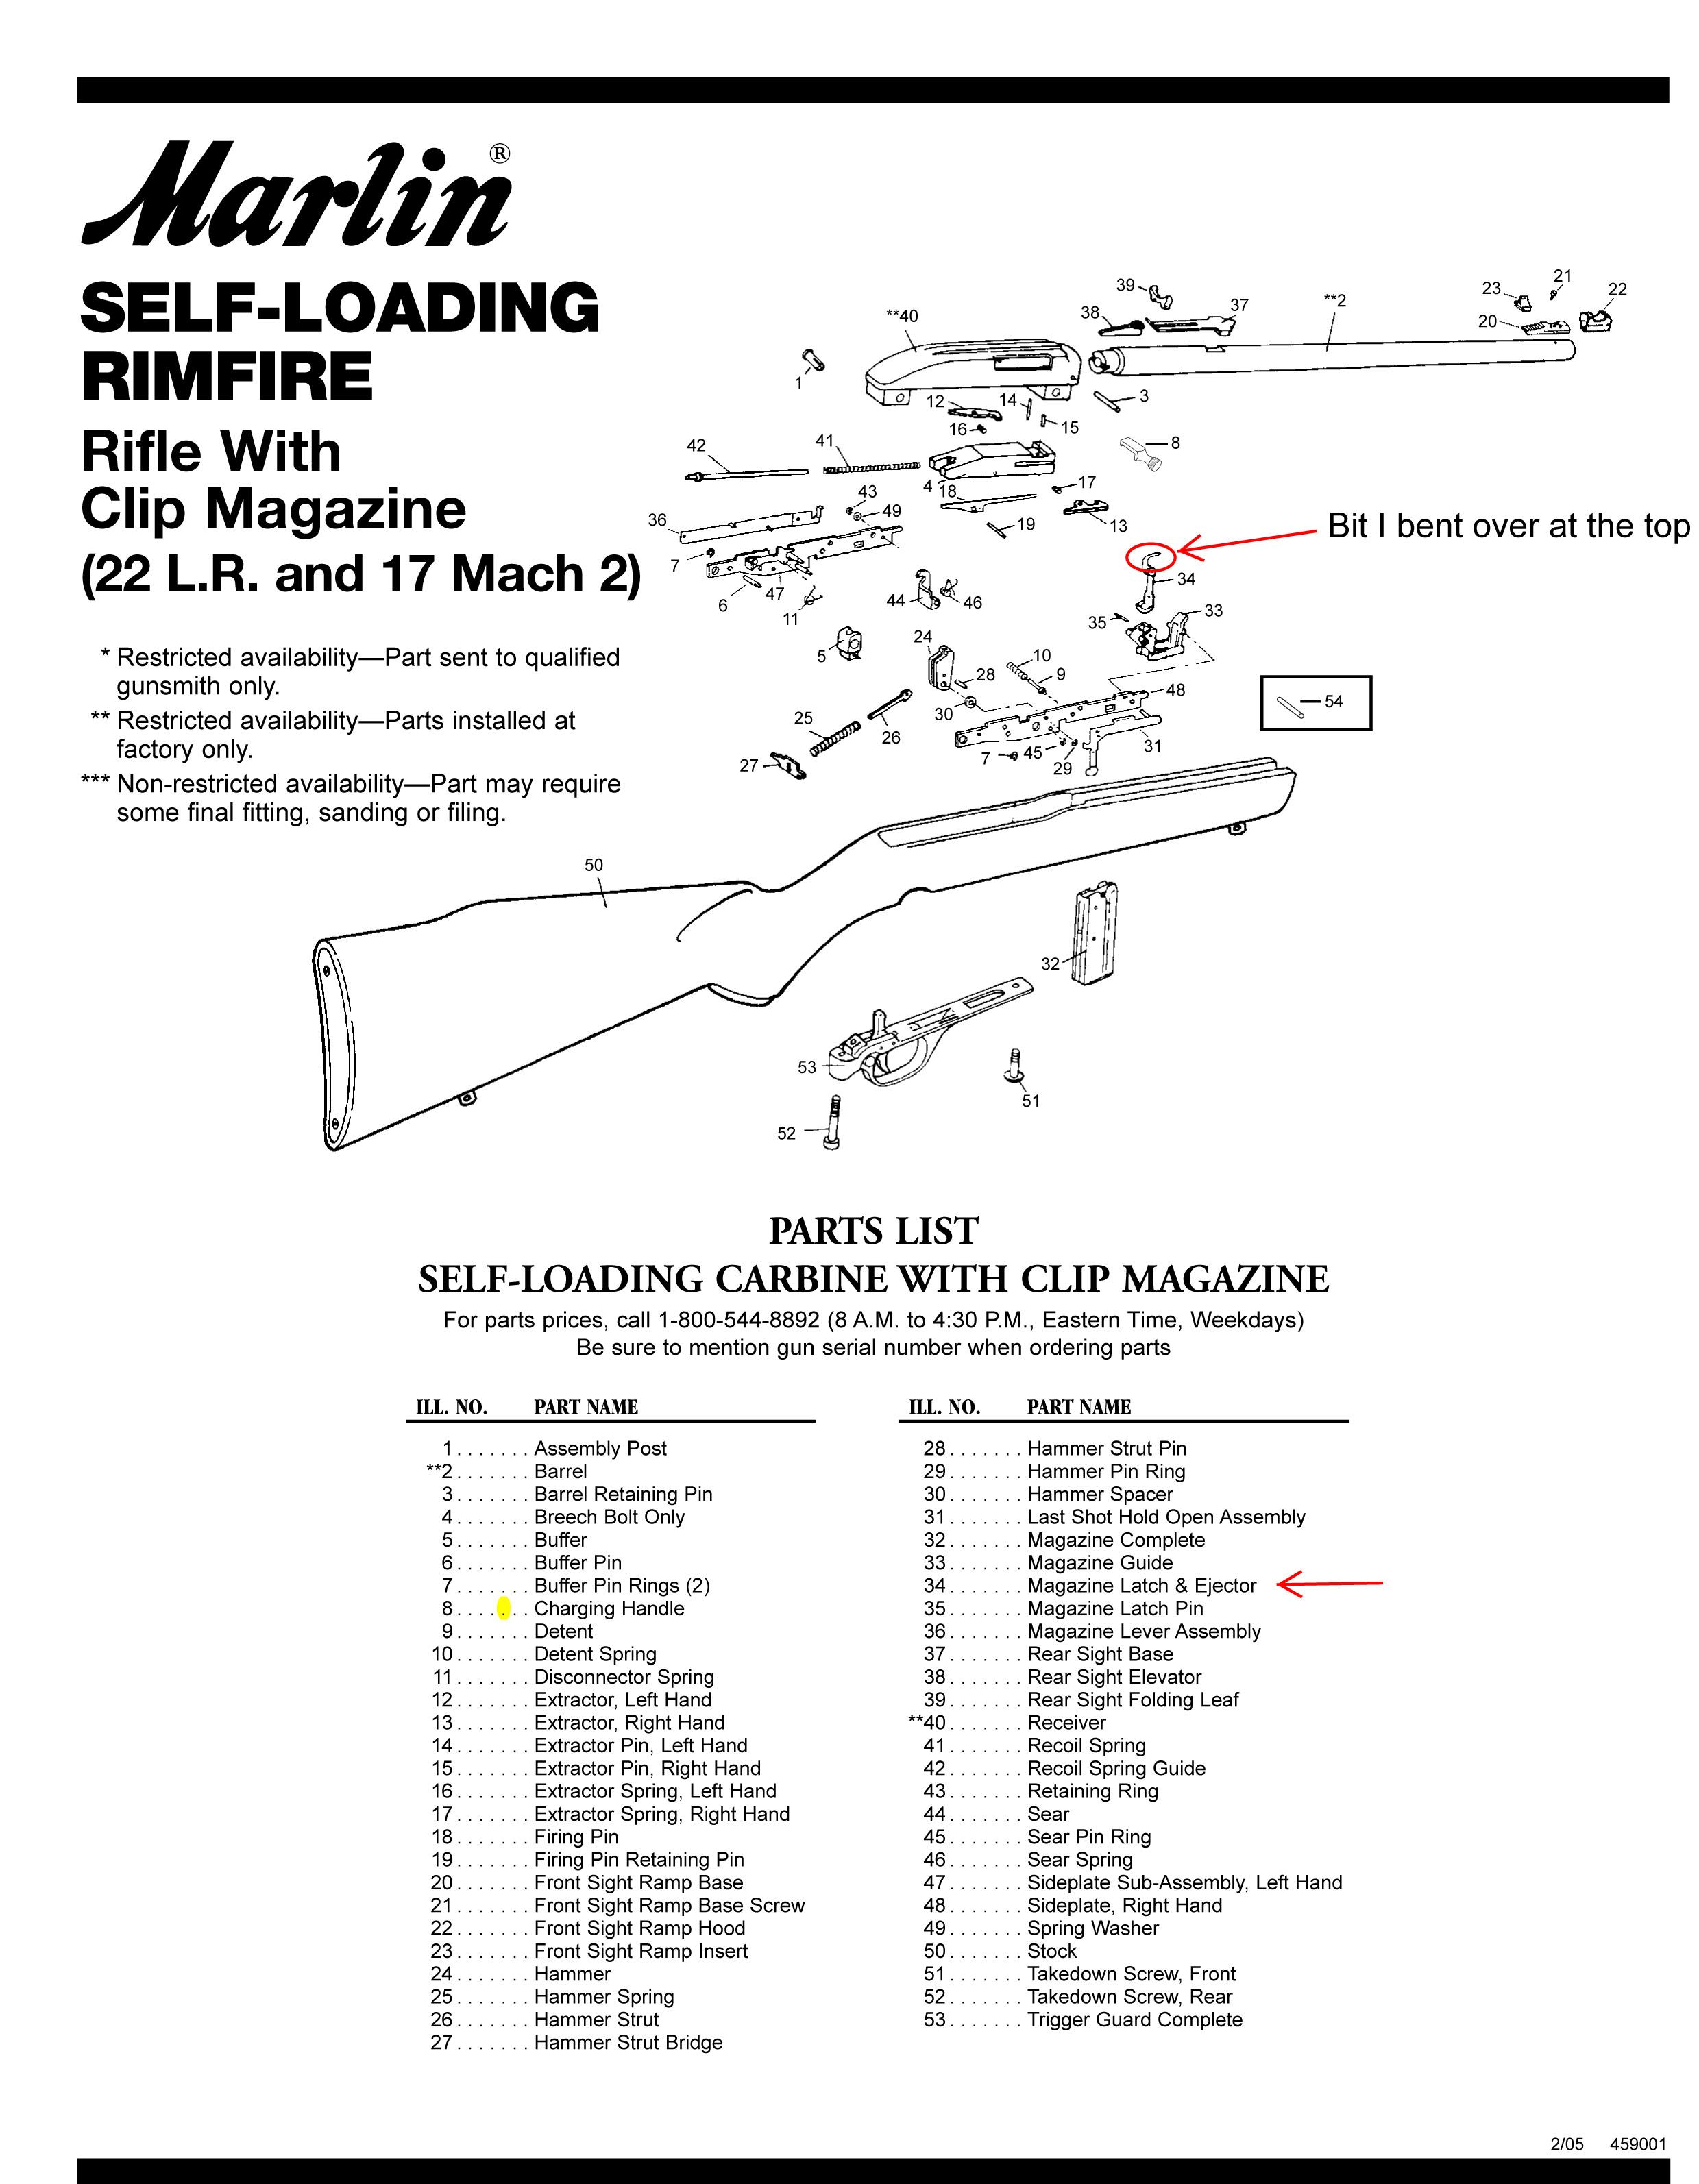 Marvelous Daisy Powerline 880 Parts Diagram Gallery - Best Image ...